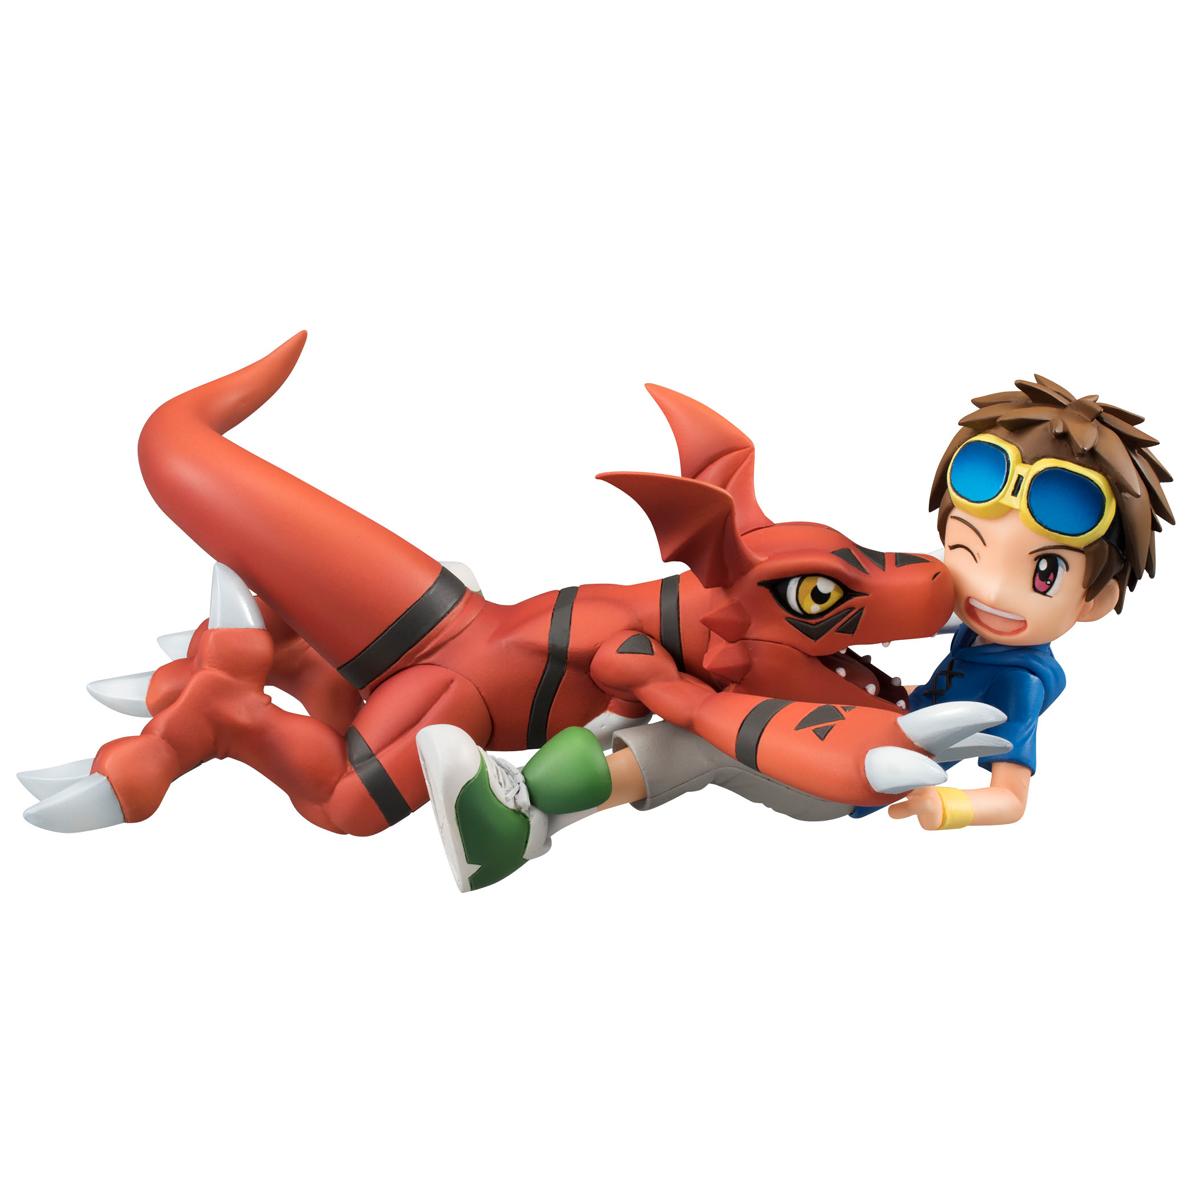 G.E.M. Digimon Tamers - Guilmon, Takato Matsuda (ของแท้)